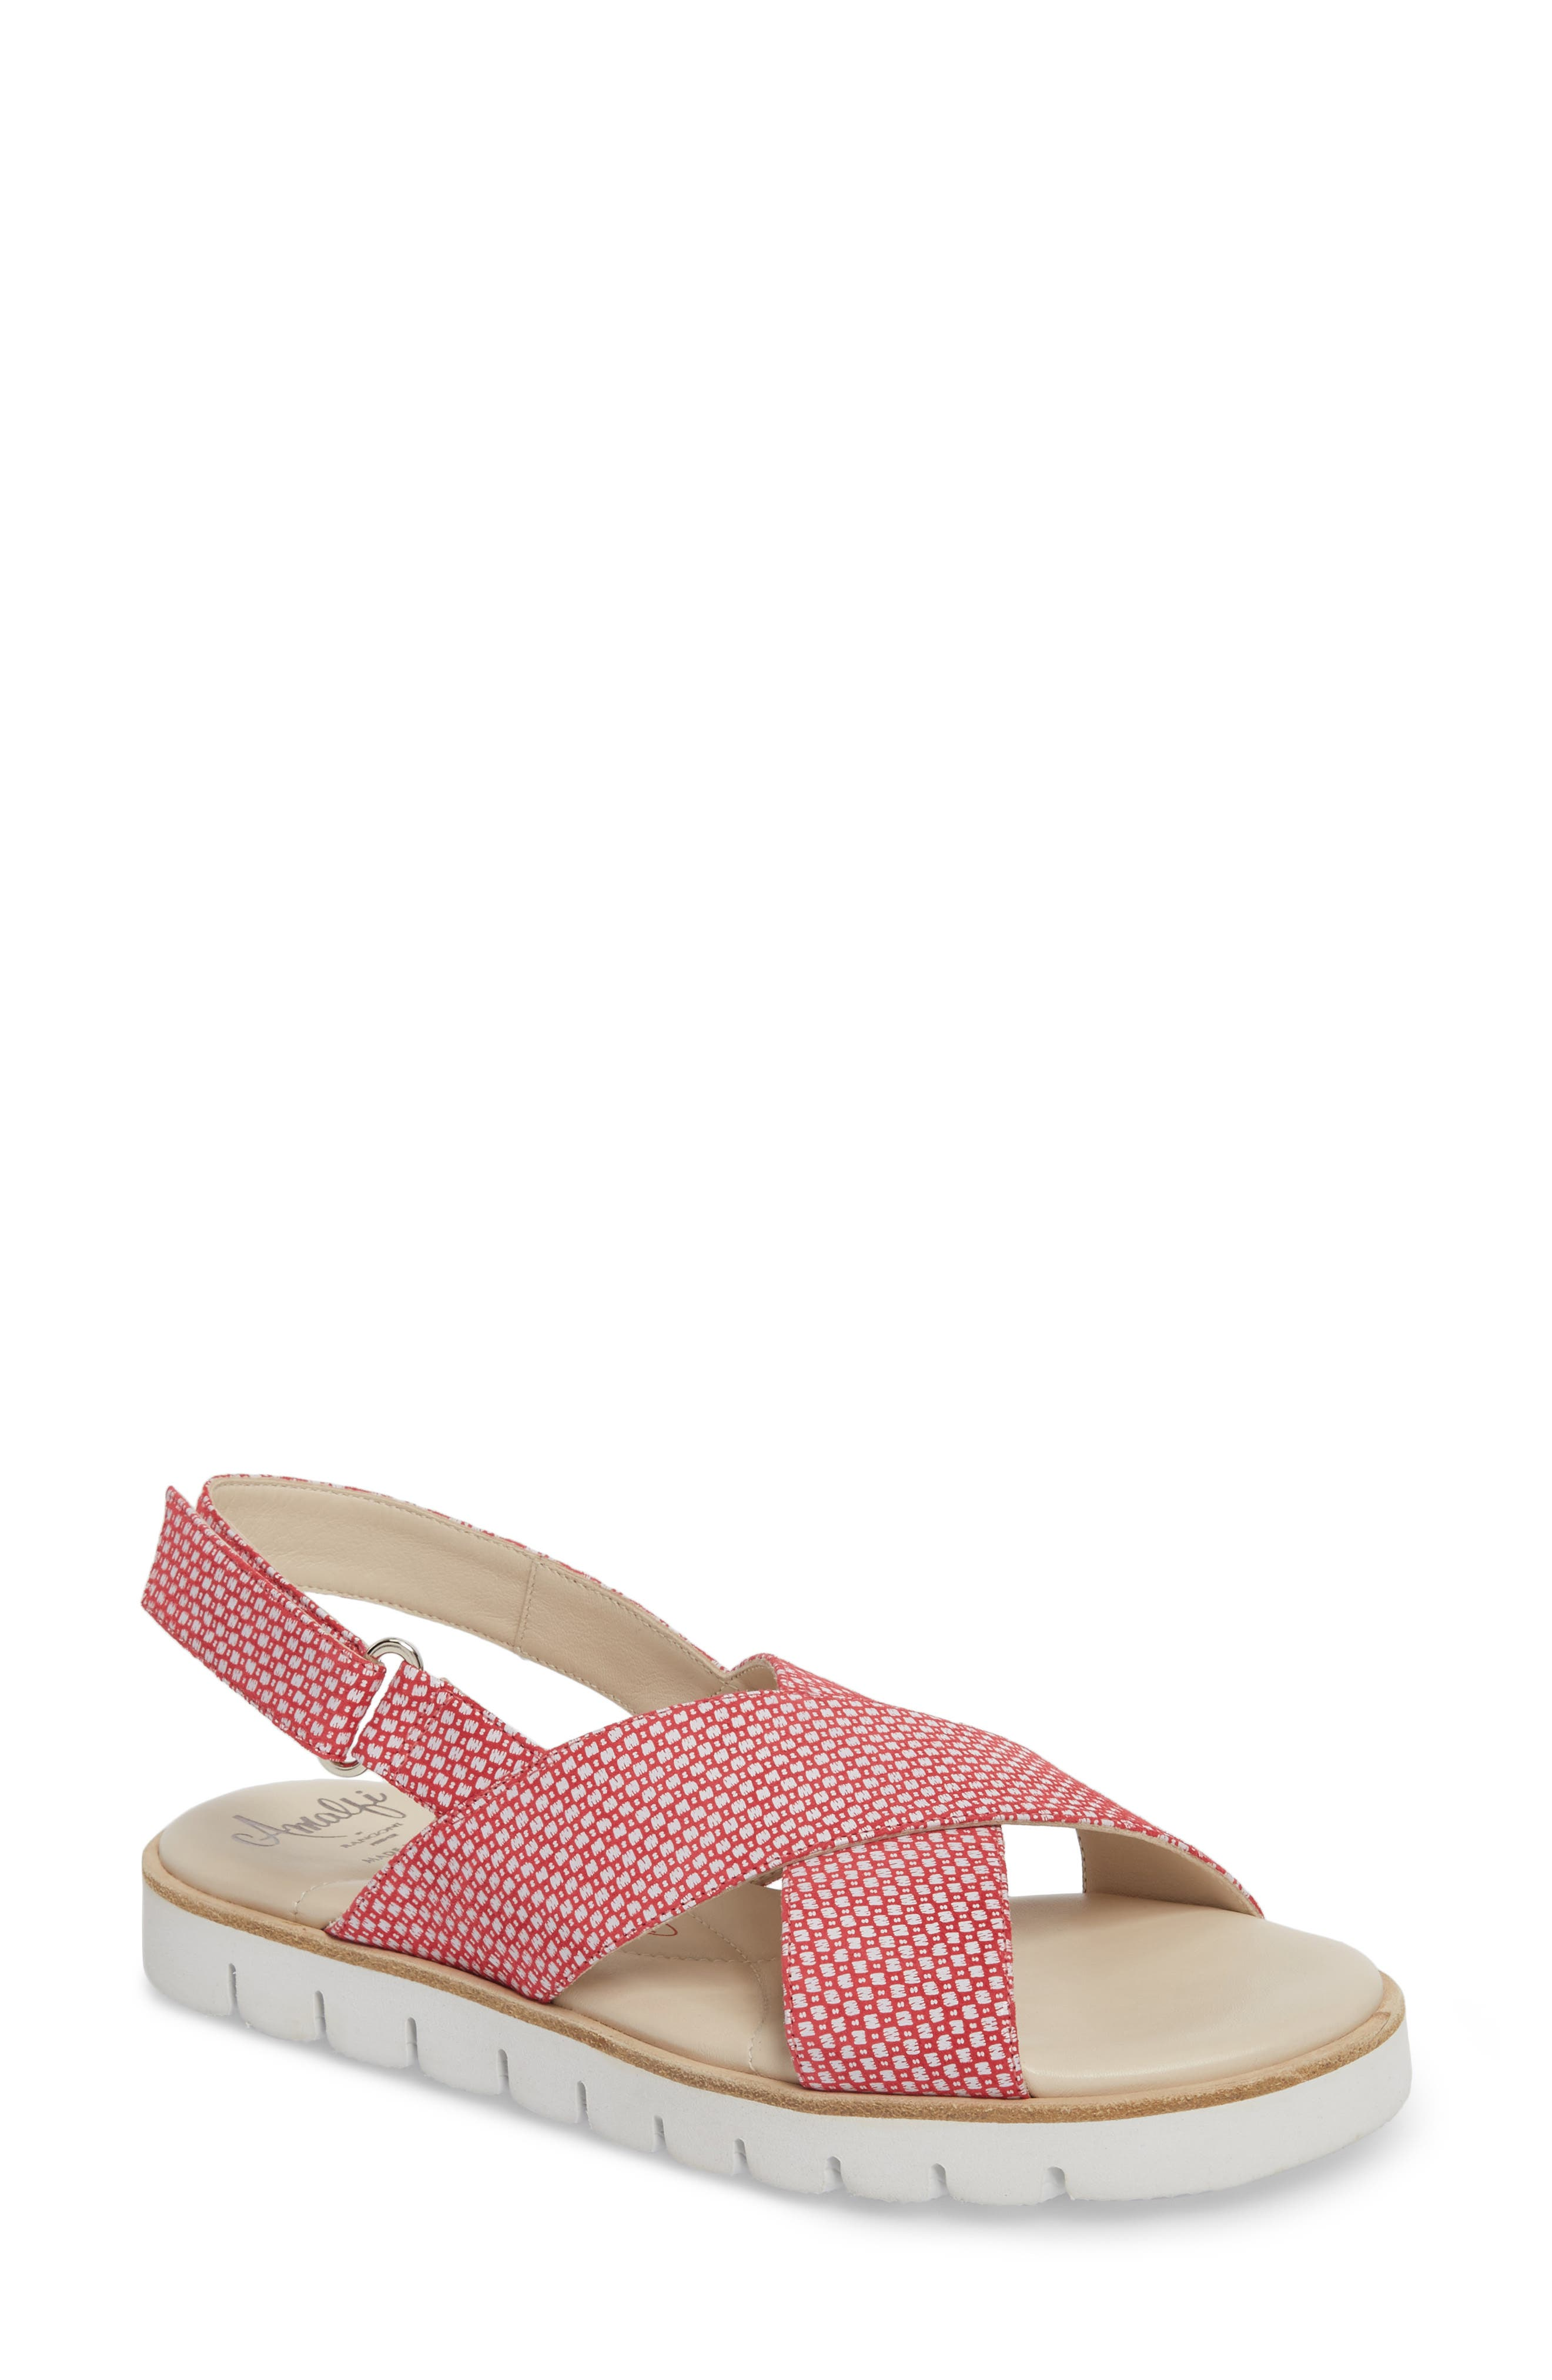 Borgo Sandal,                         Main,                         color, Red/ White Leather